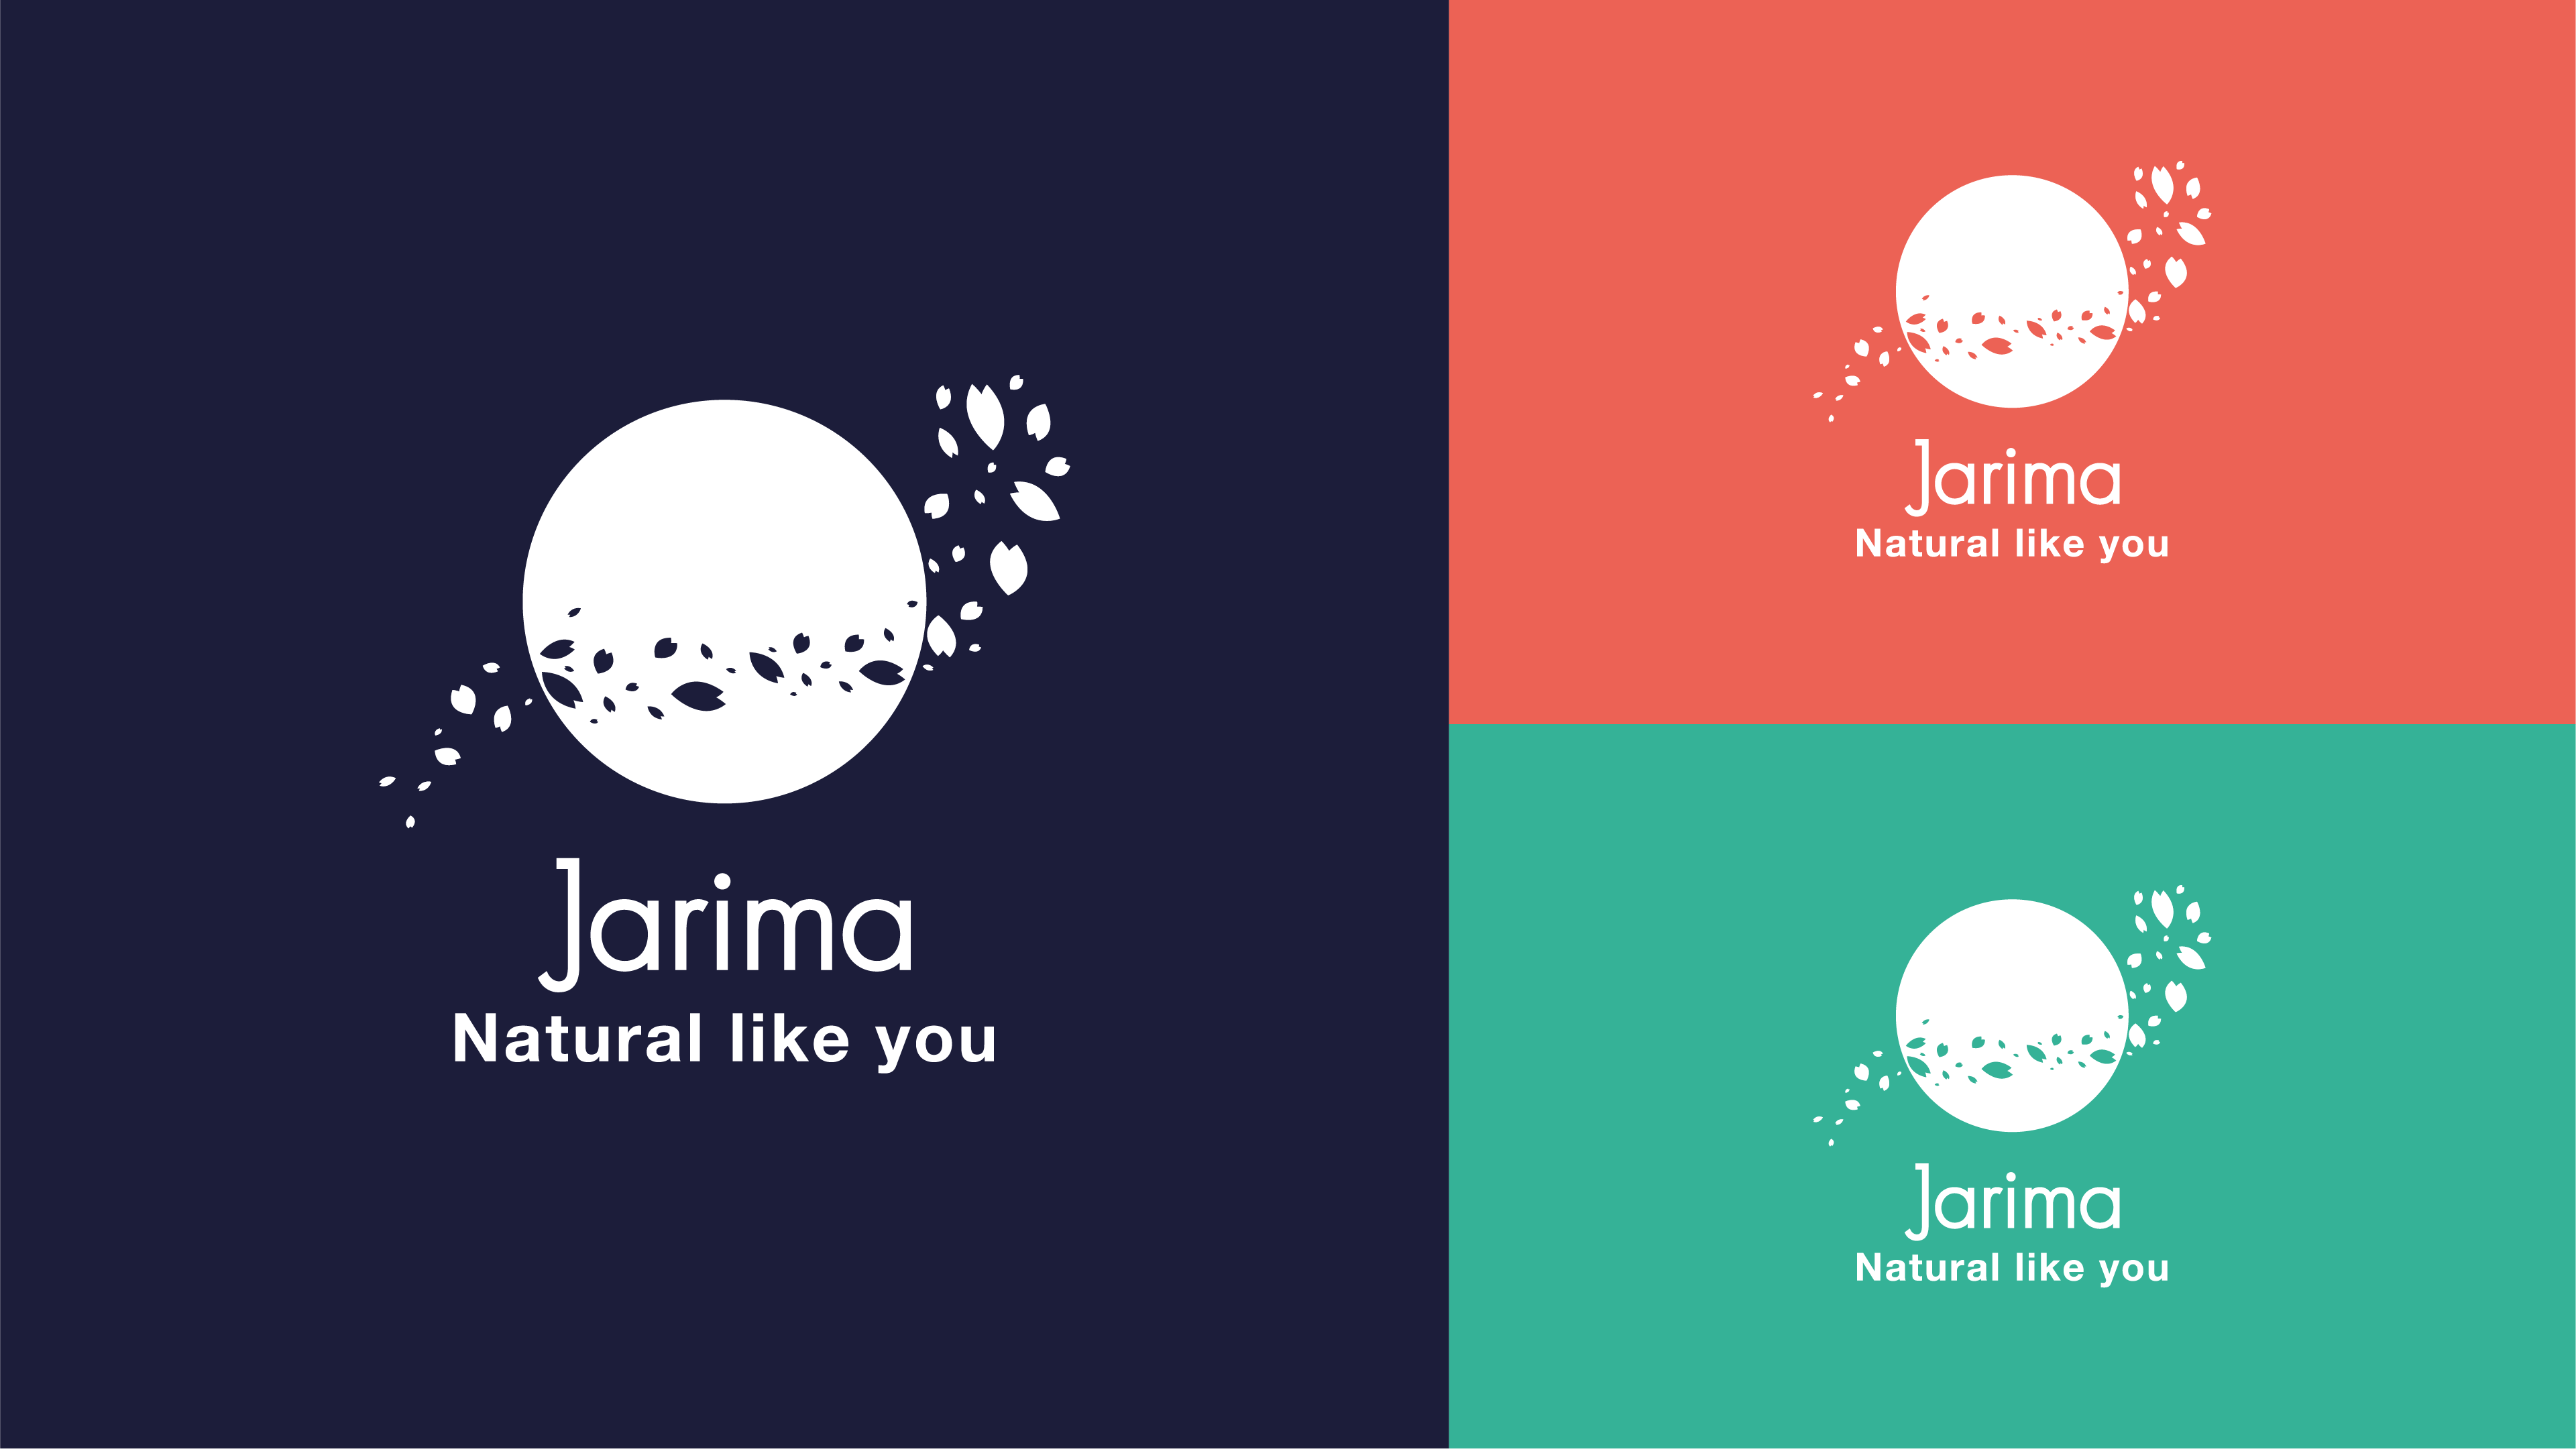 jarima-logo-by-elevendots-portfolio